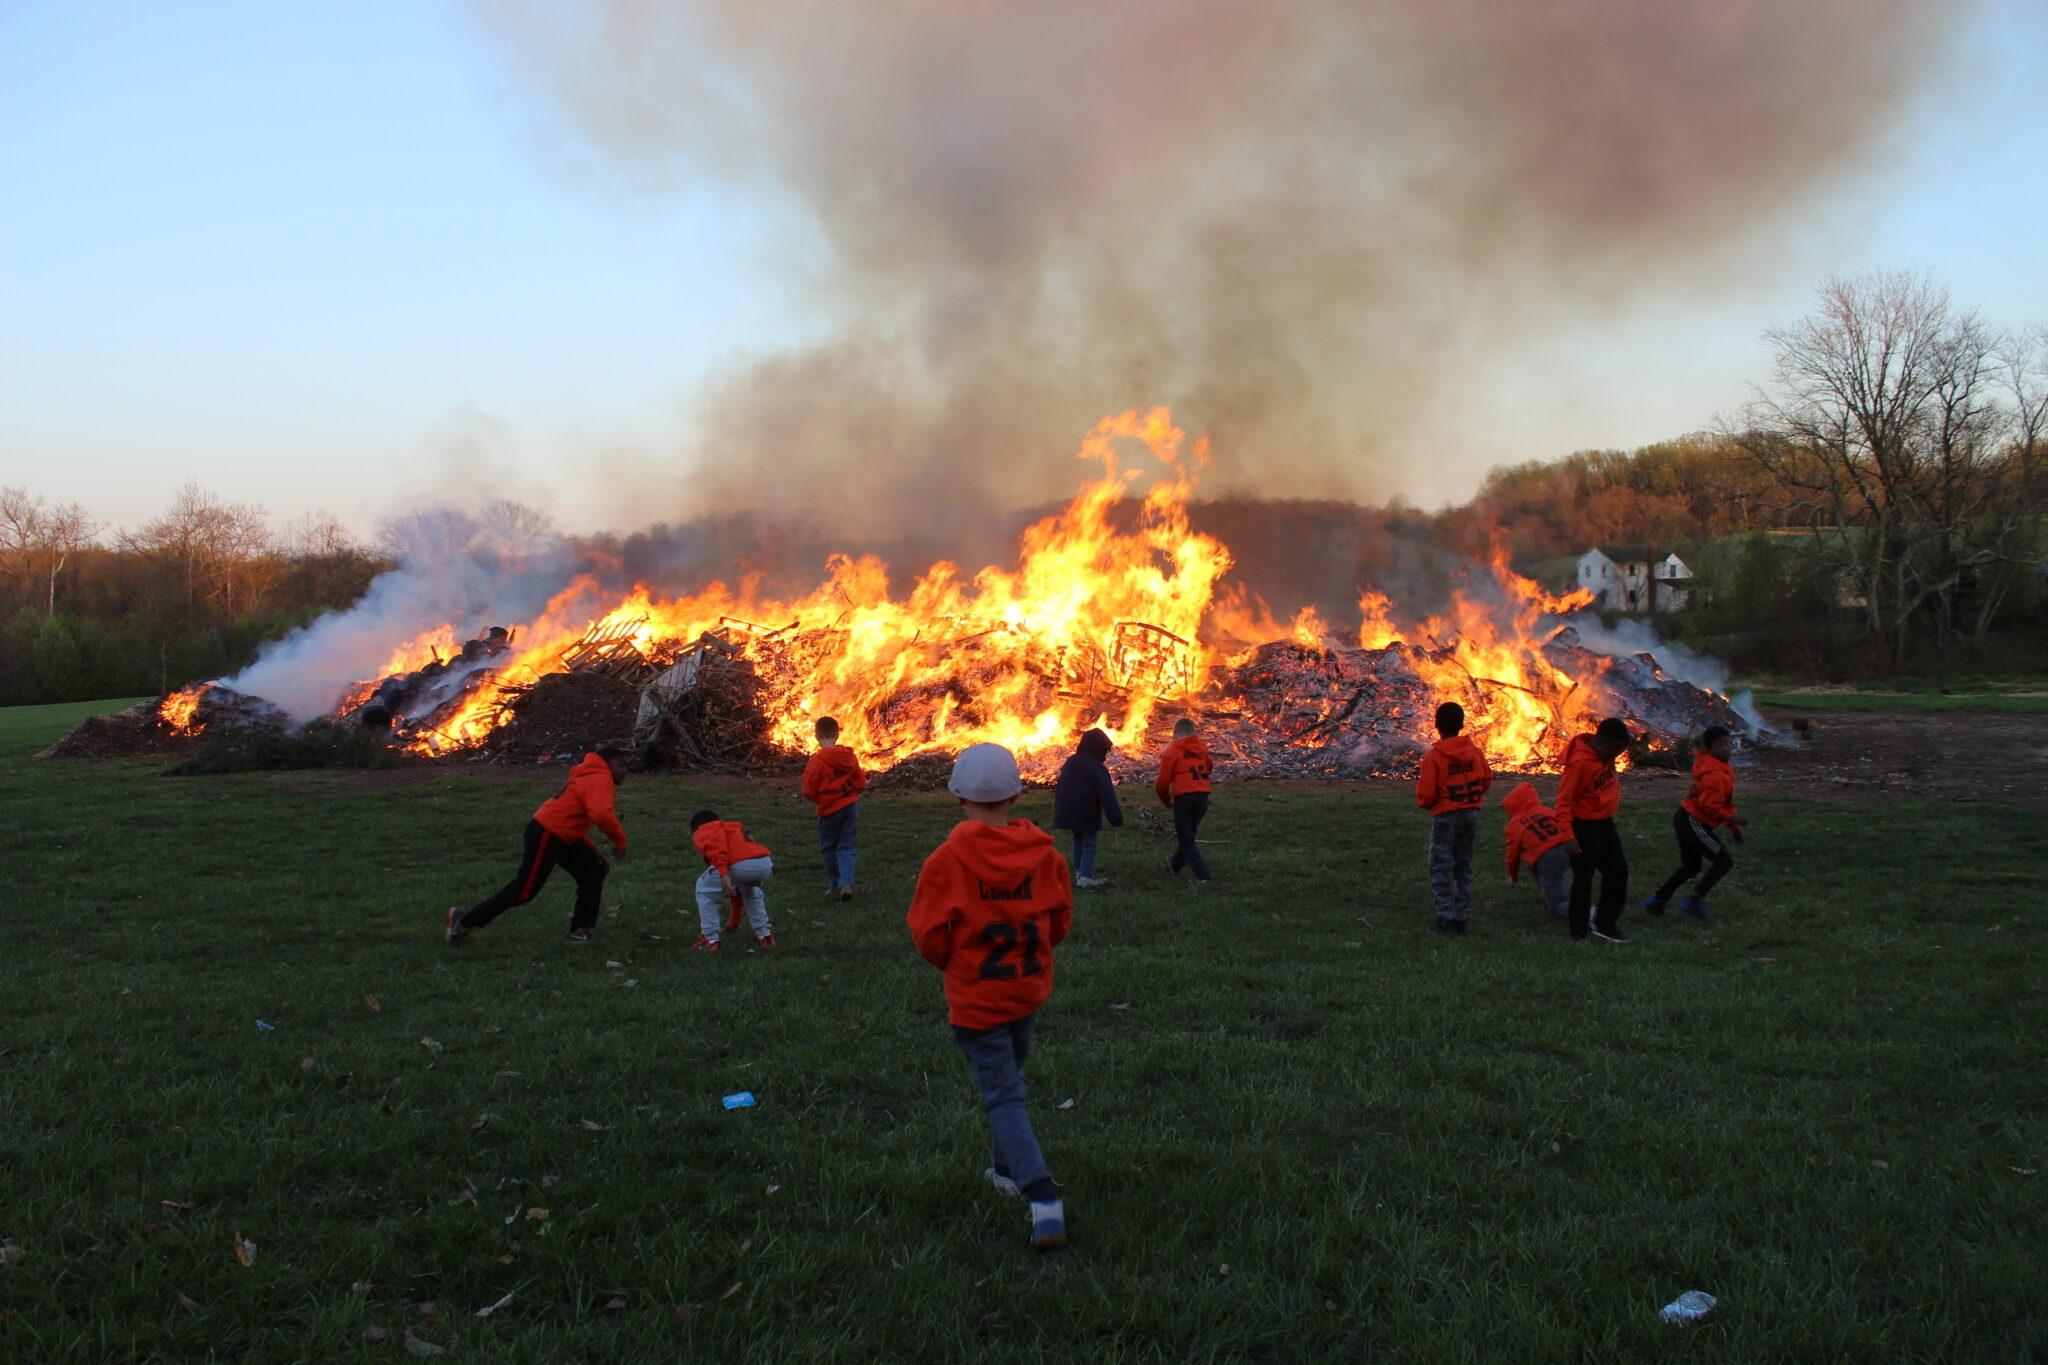 Bonfire-Landscaping-1-2048x1365